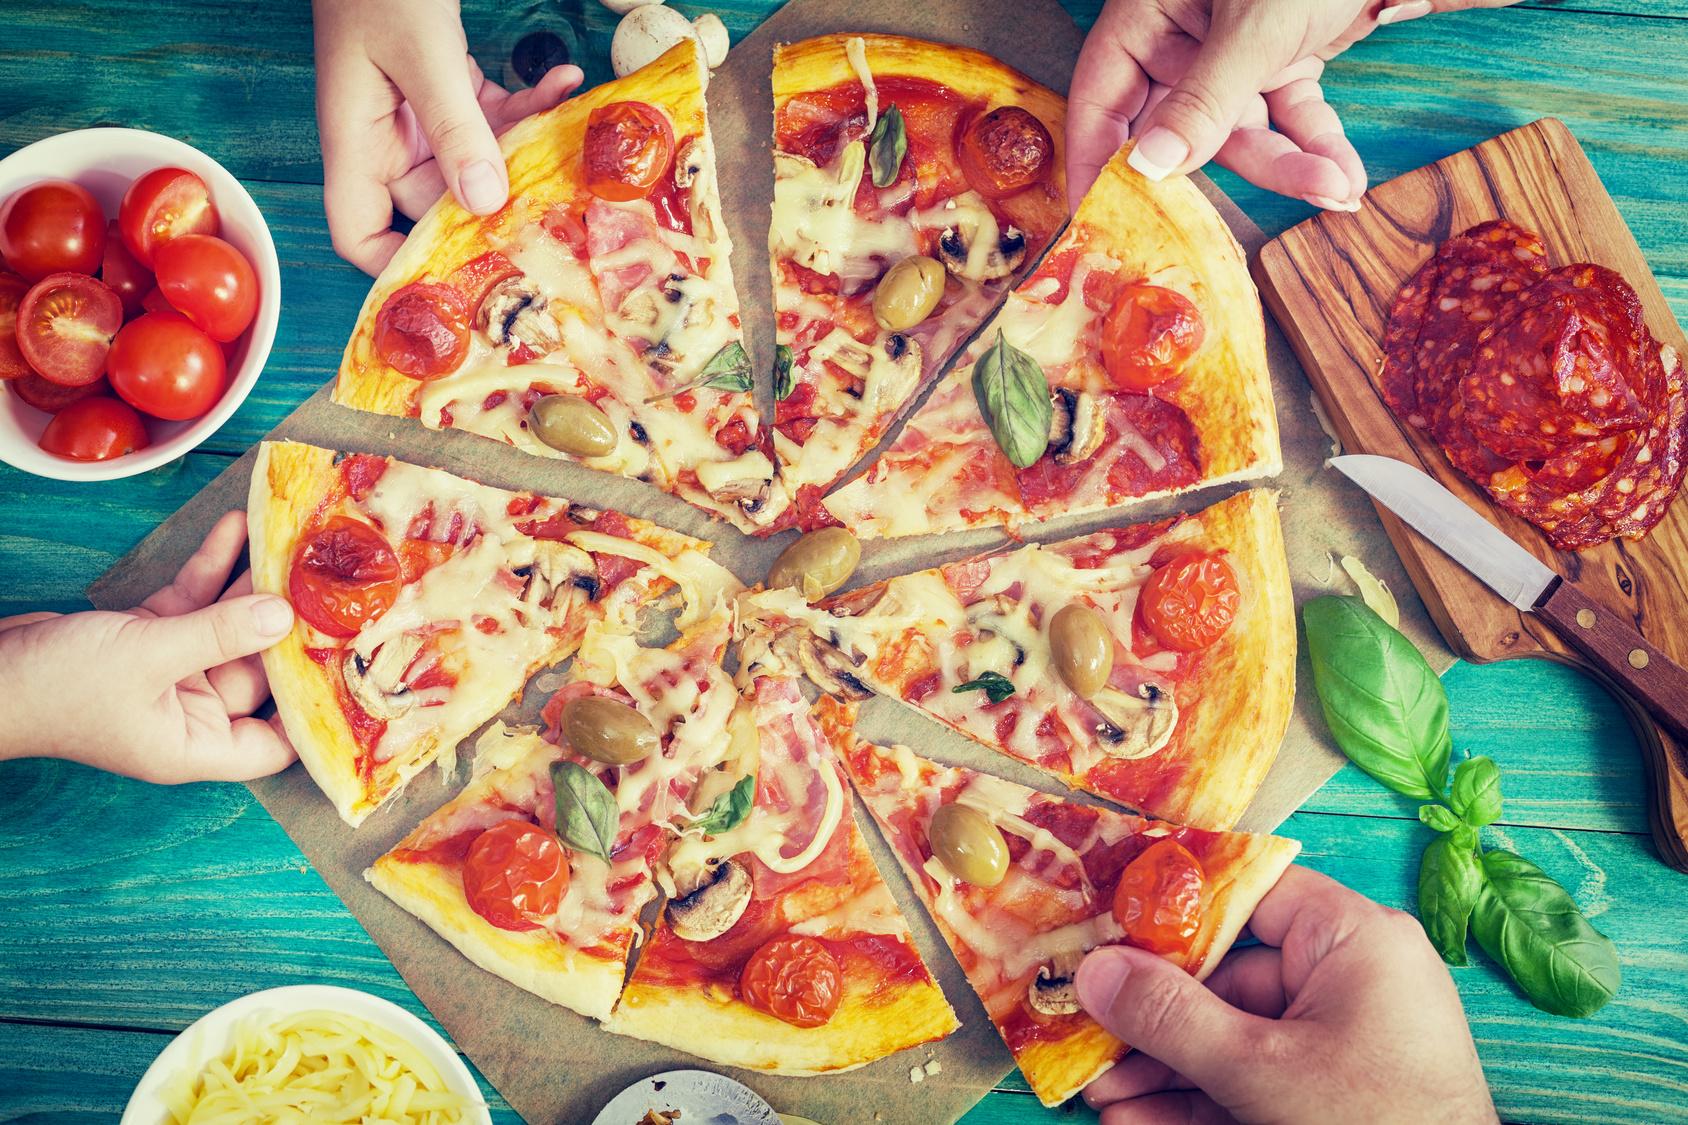 BodyChange_Cheat Day_Pizza